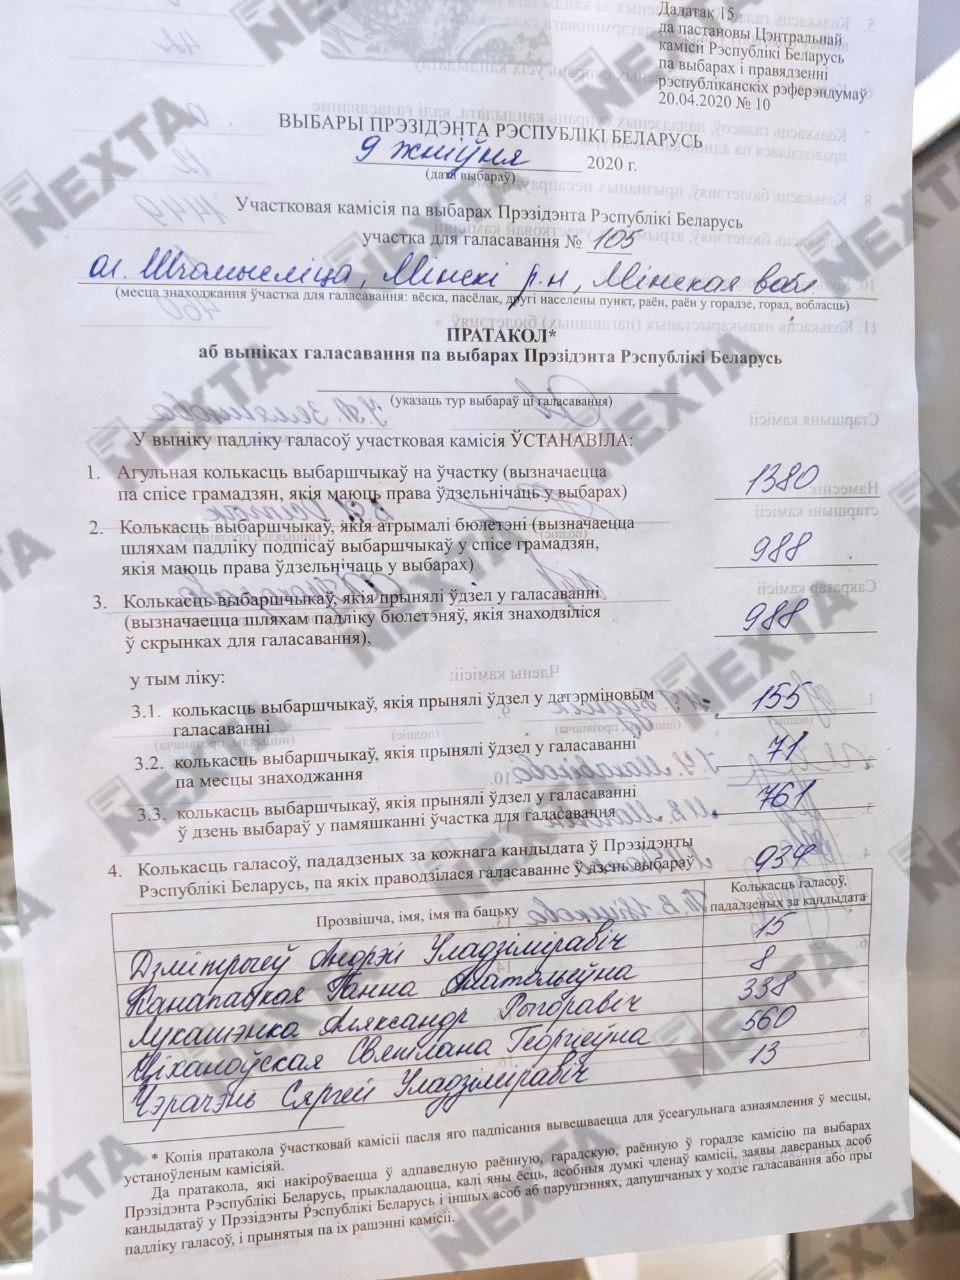 На тех участках, где считали честно, Лукашенко проиграл